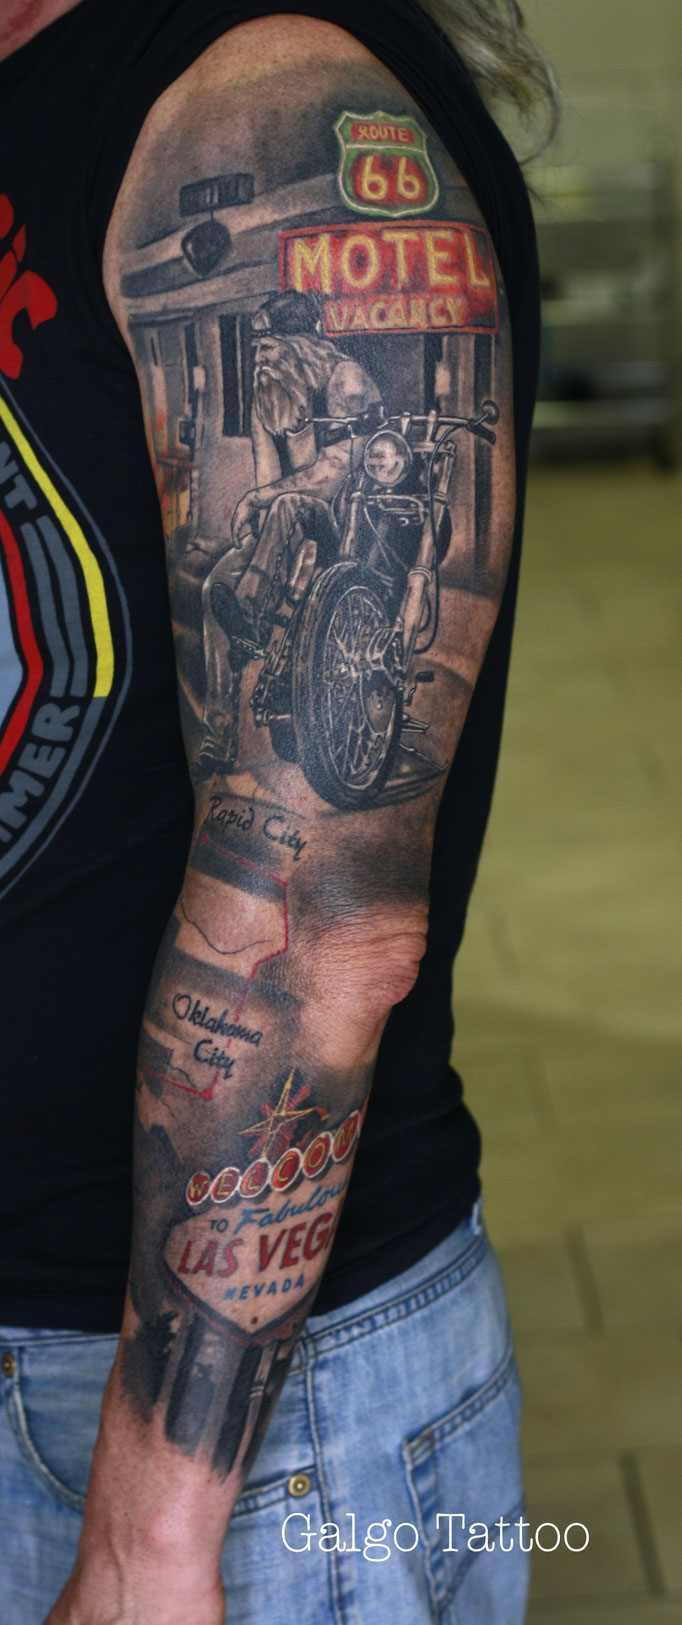 Tatuaje realismo de la ruta 66, manga completa en black and grey con algunos tonos de color. Full sleeve tattoo route 66